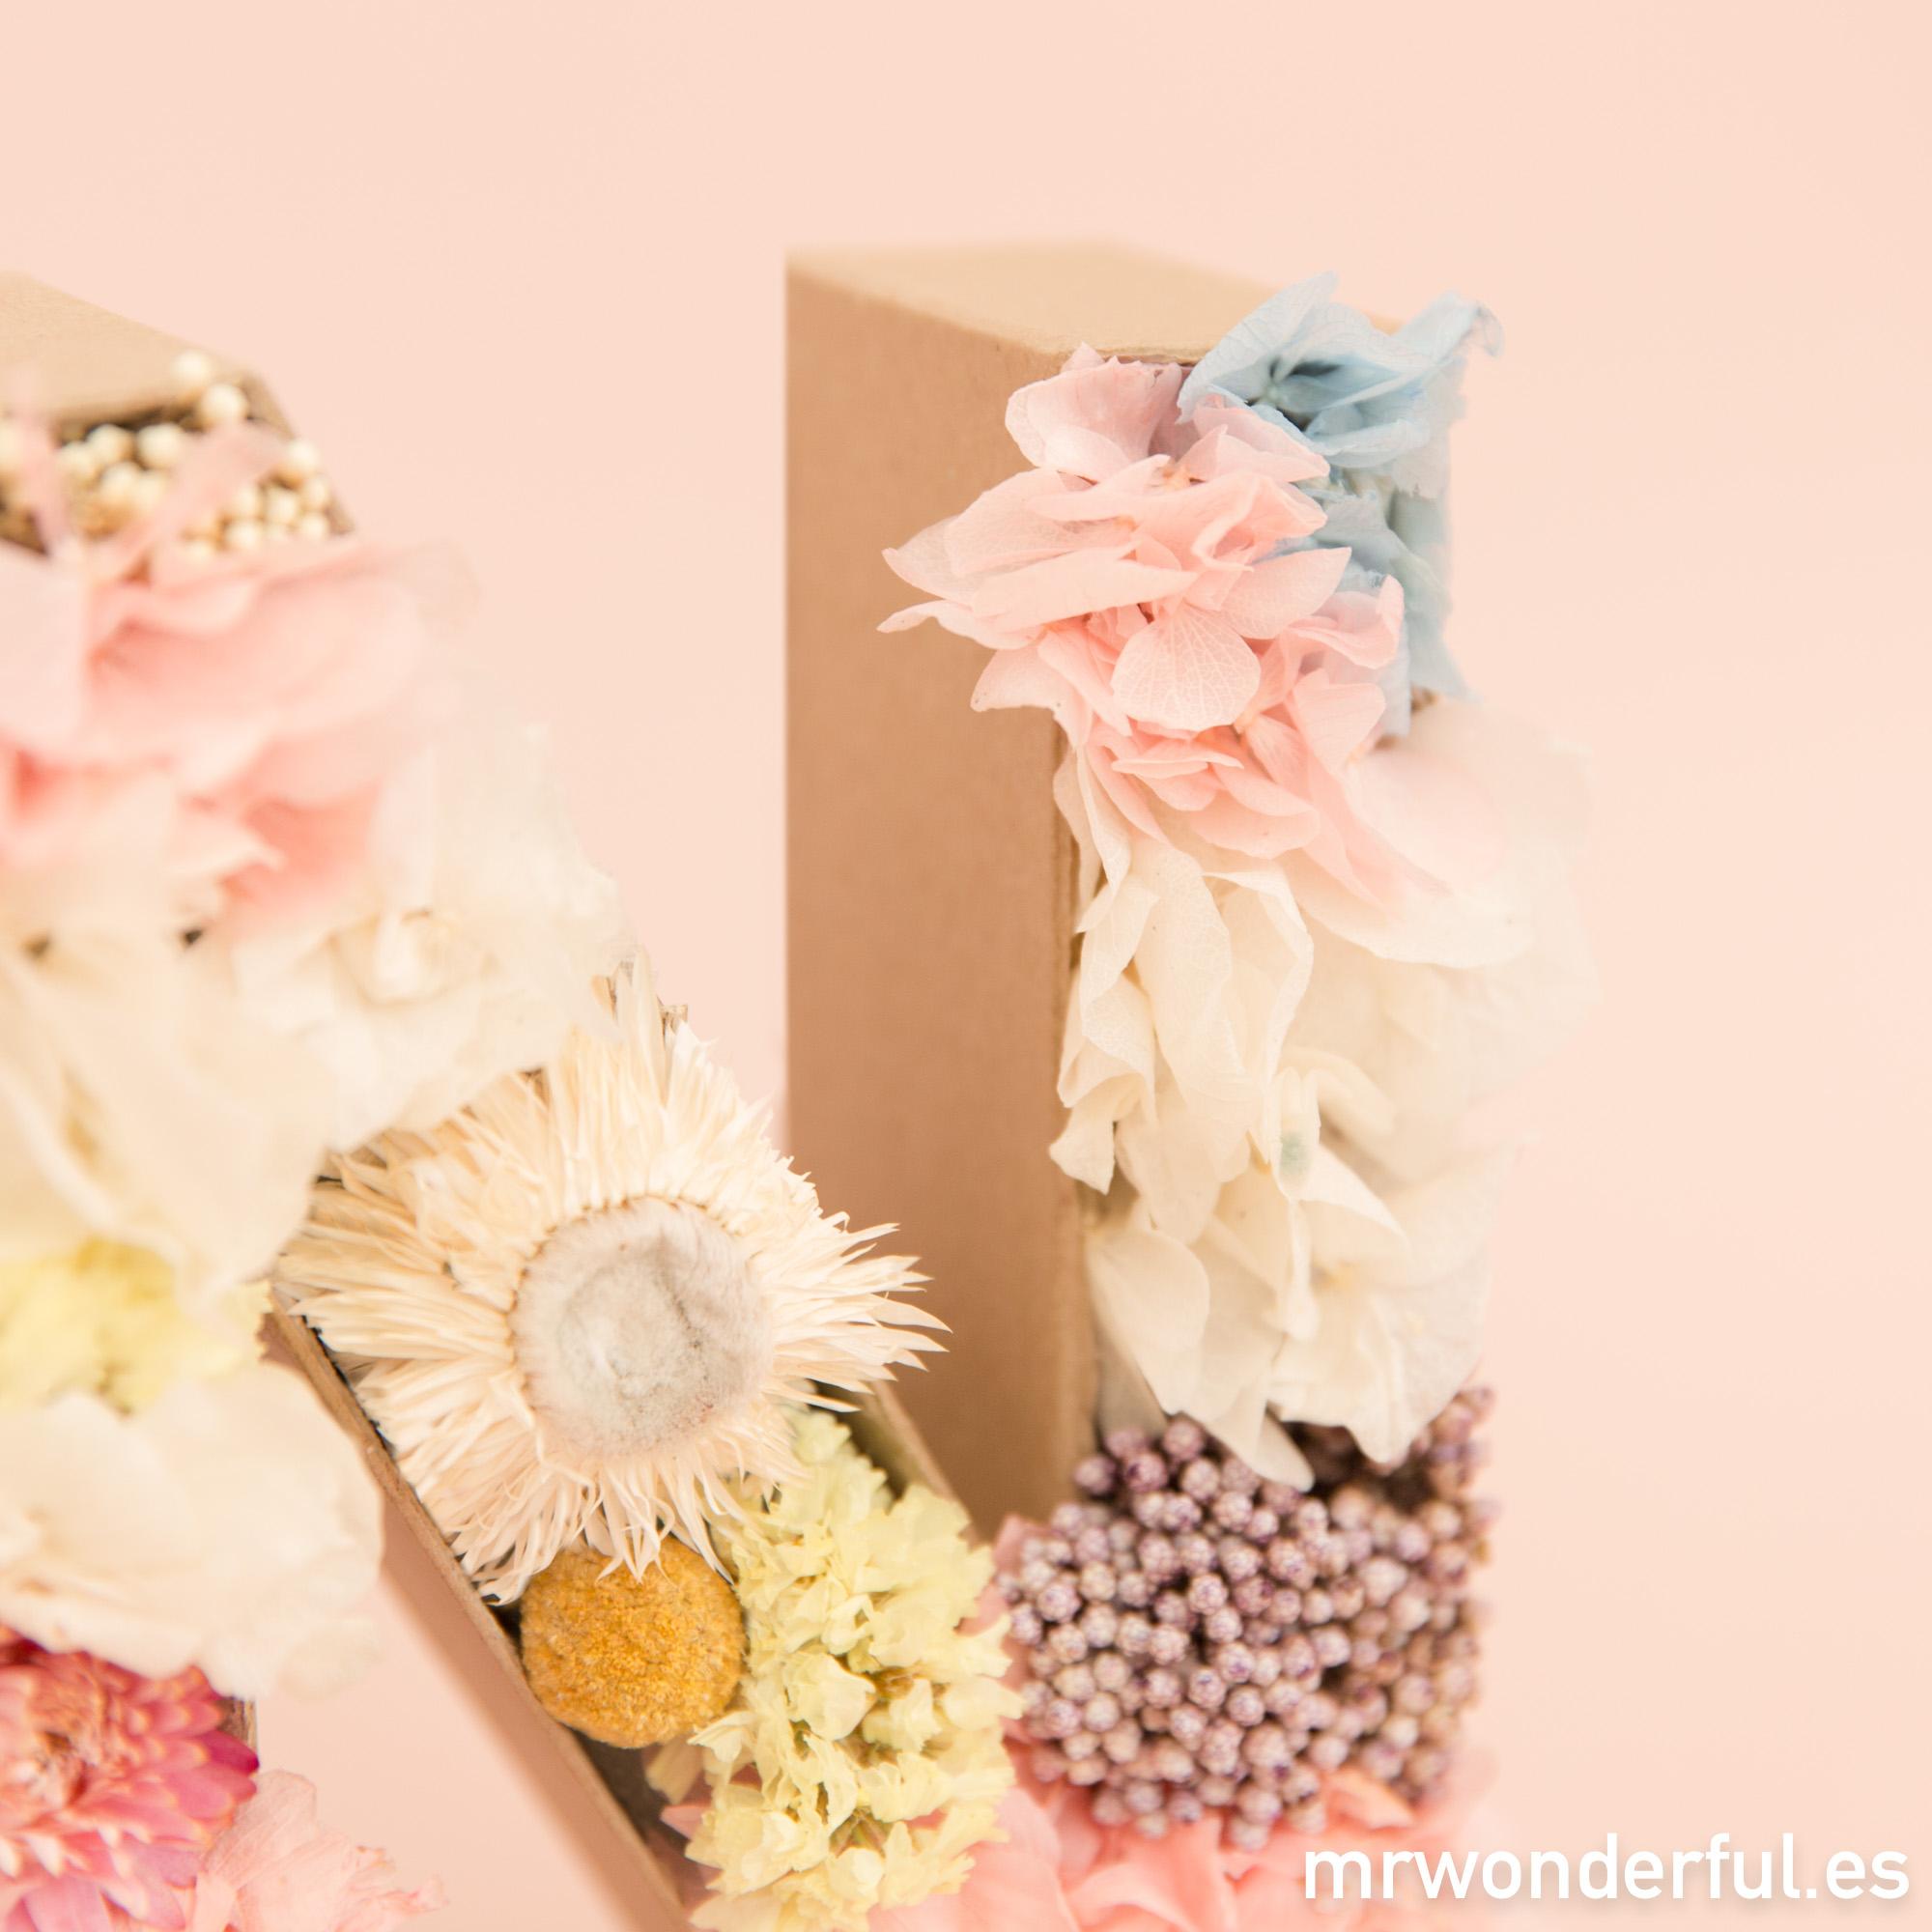 mrwonderful_letras-flores_boho-deco_2017-5-editar